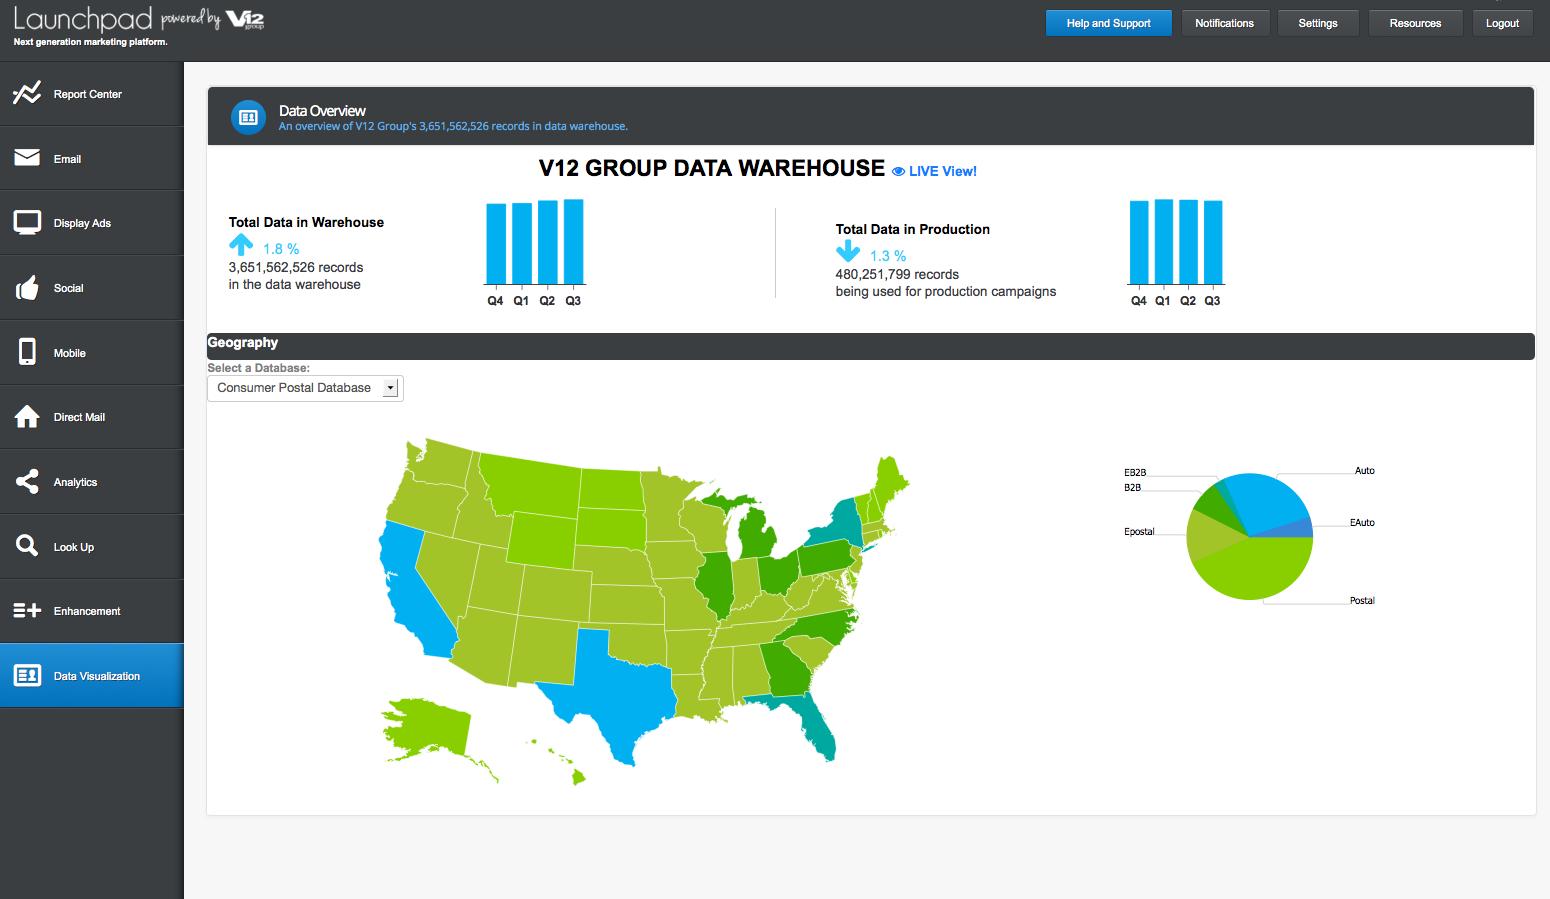 Data visualization tool